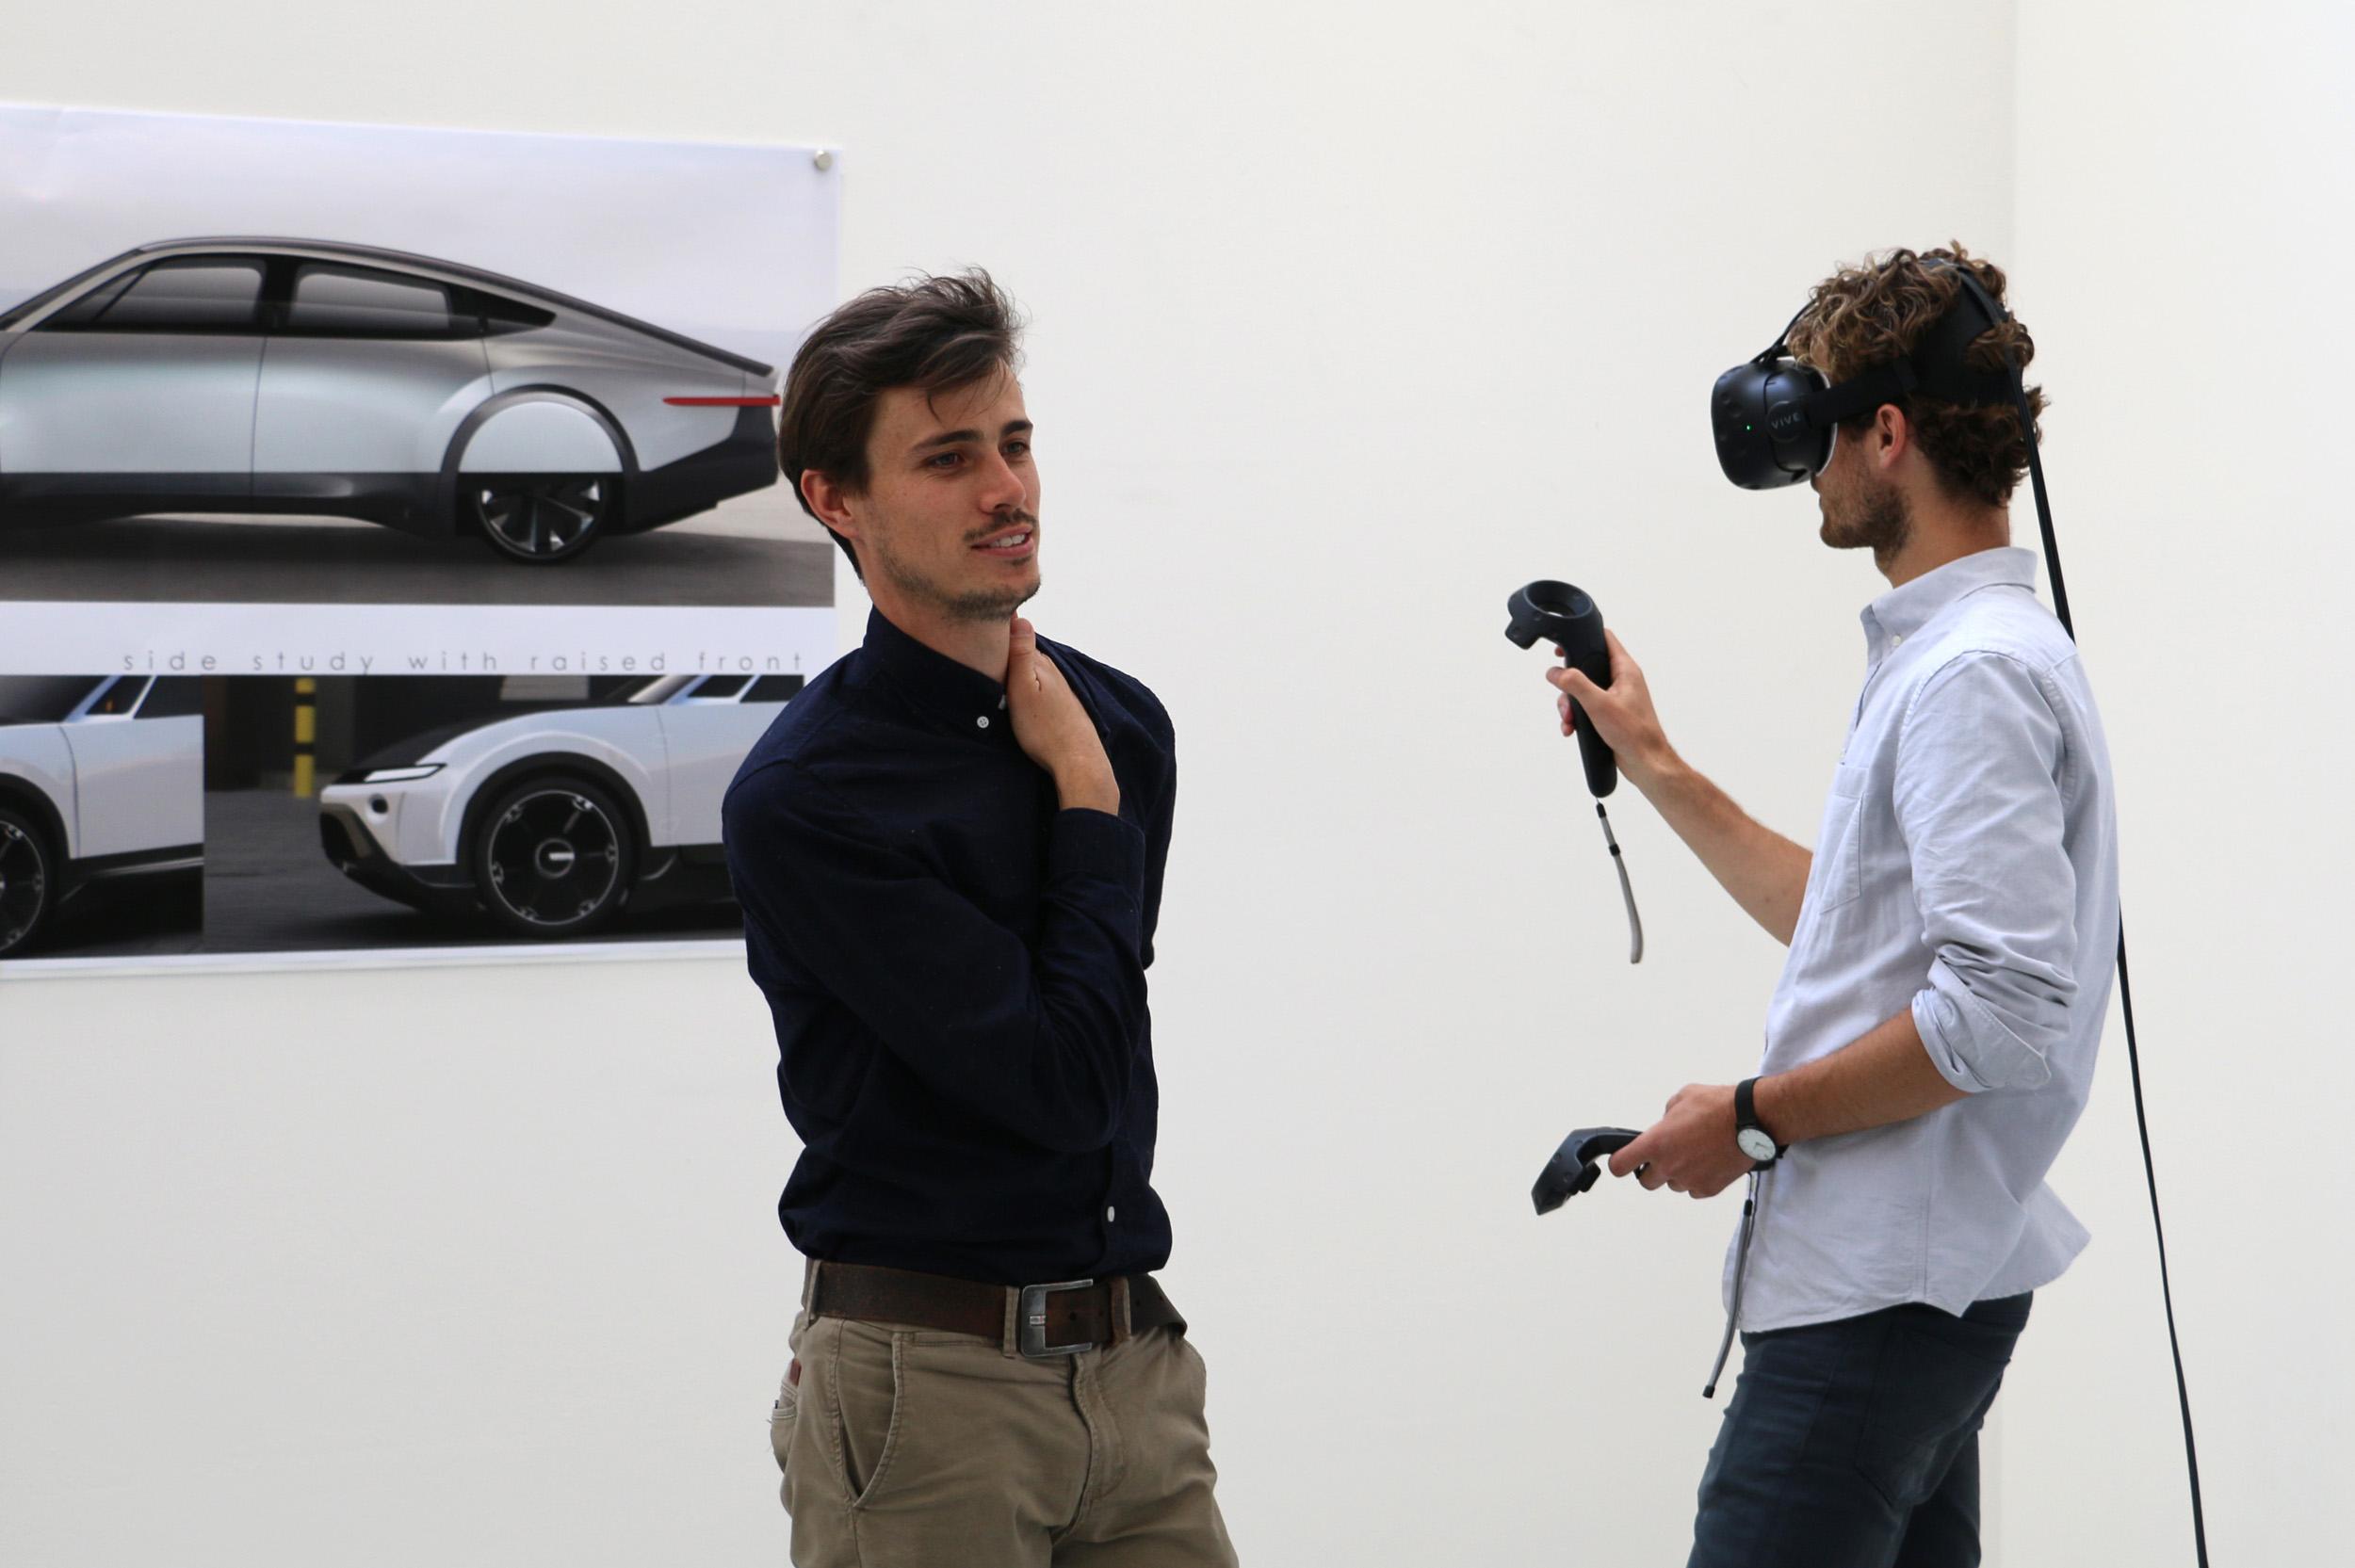 06b_ Koen van Ham Lex Hoefsloot VR Review.jpg